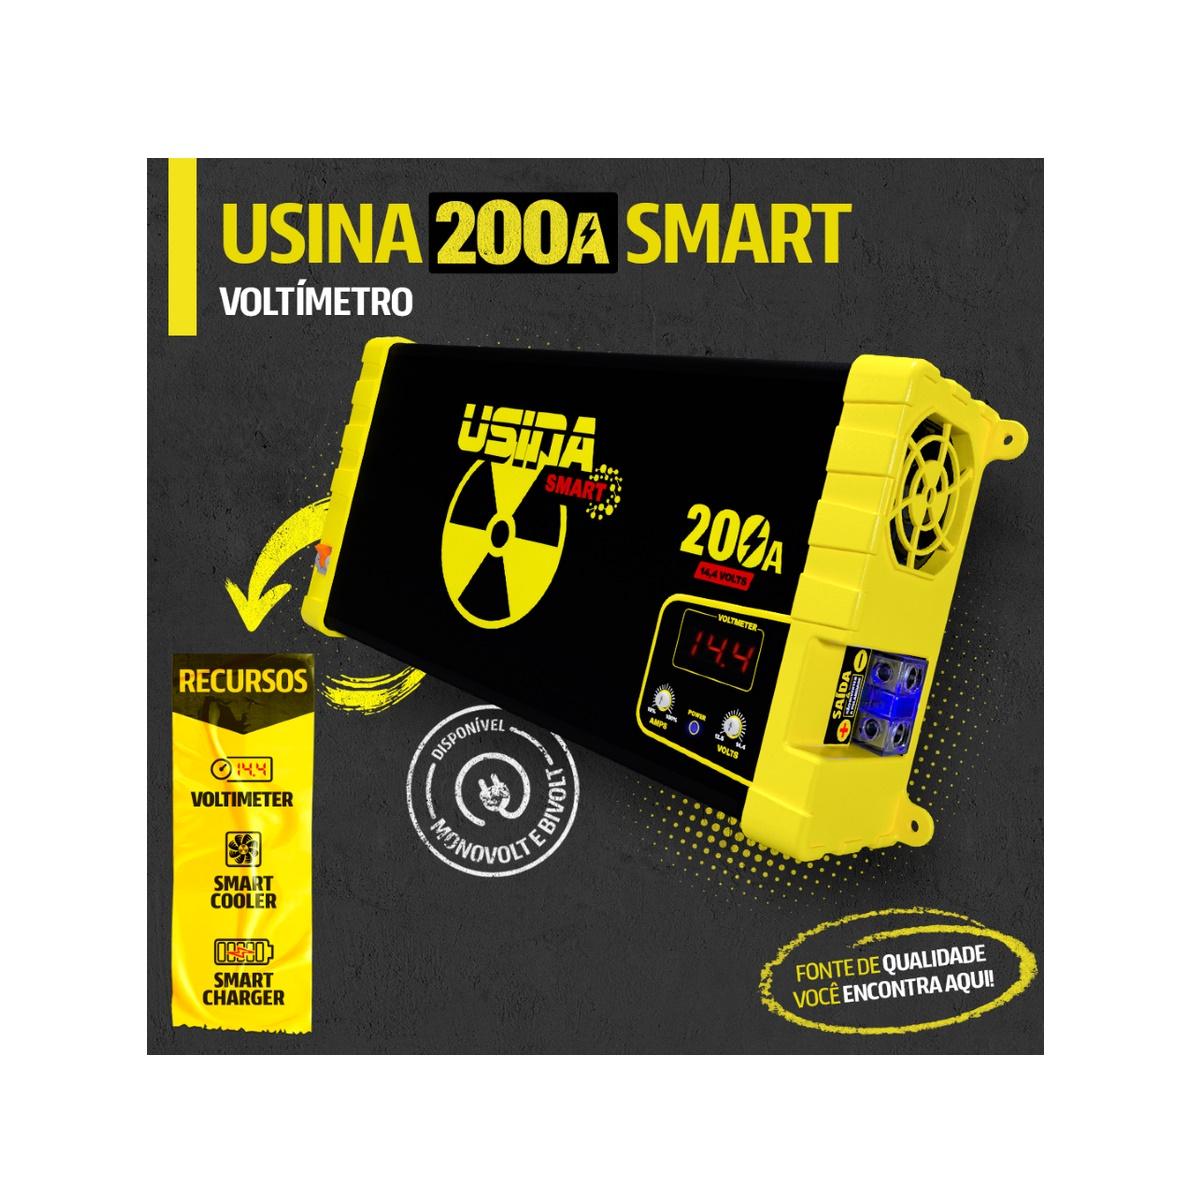 Fonte e Carregador Usina 200A Smart 12 Volts com Voltímetro e Amperímetro Bivolt